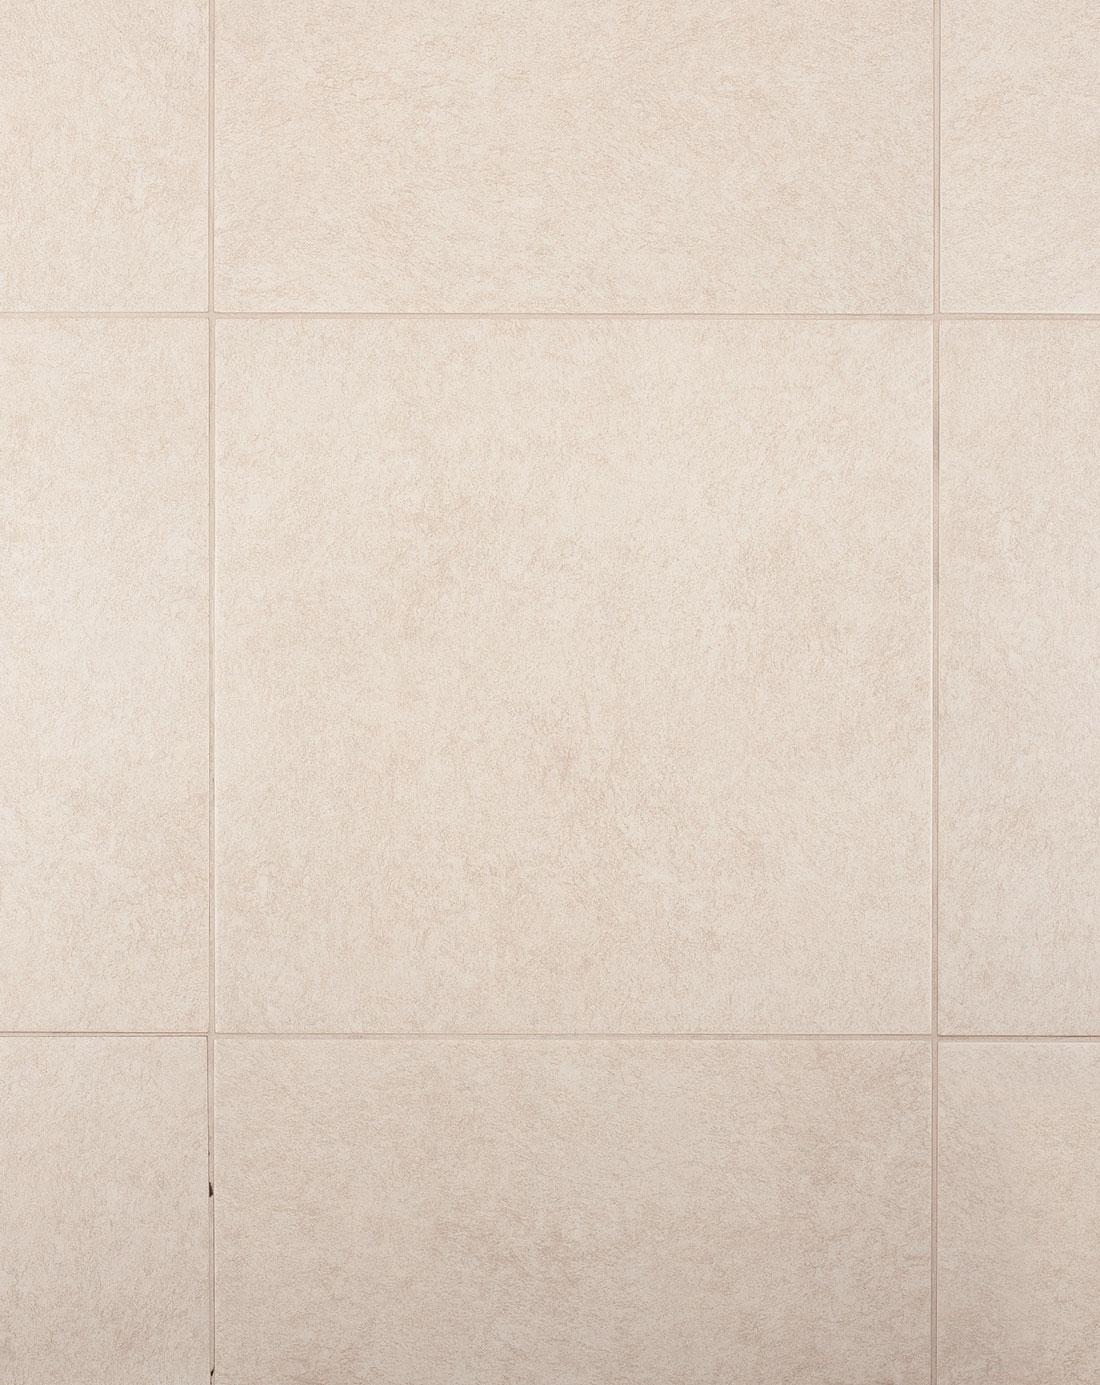 Picadily Beige Floor Tile - Bathroom Tiles Direct